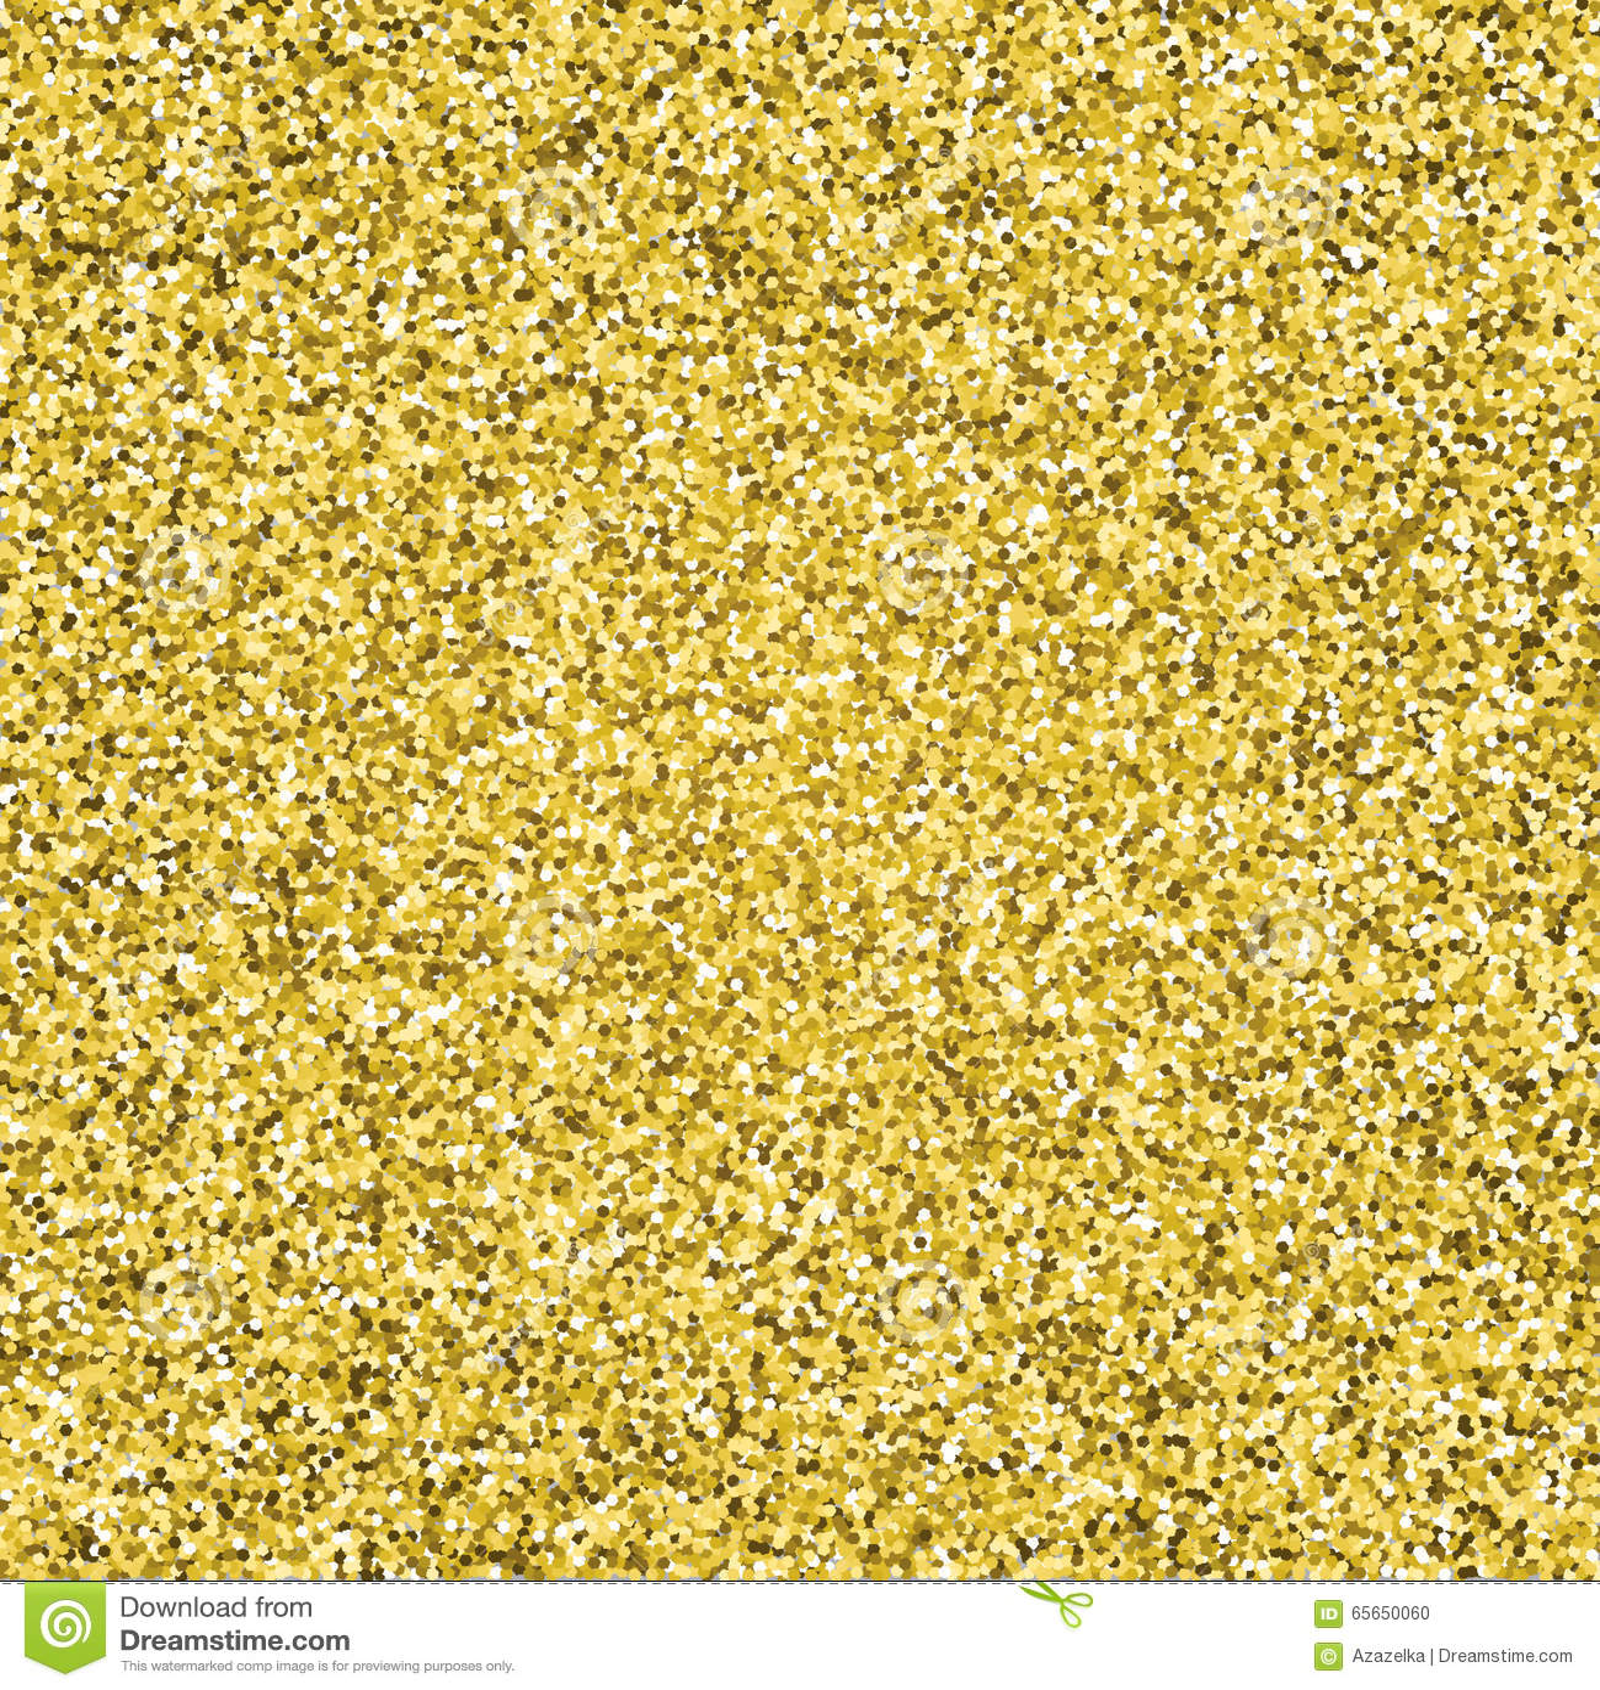 ... . Shiny glam abstract texture. Tile sparkle golden confetti backdrop